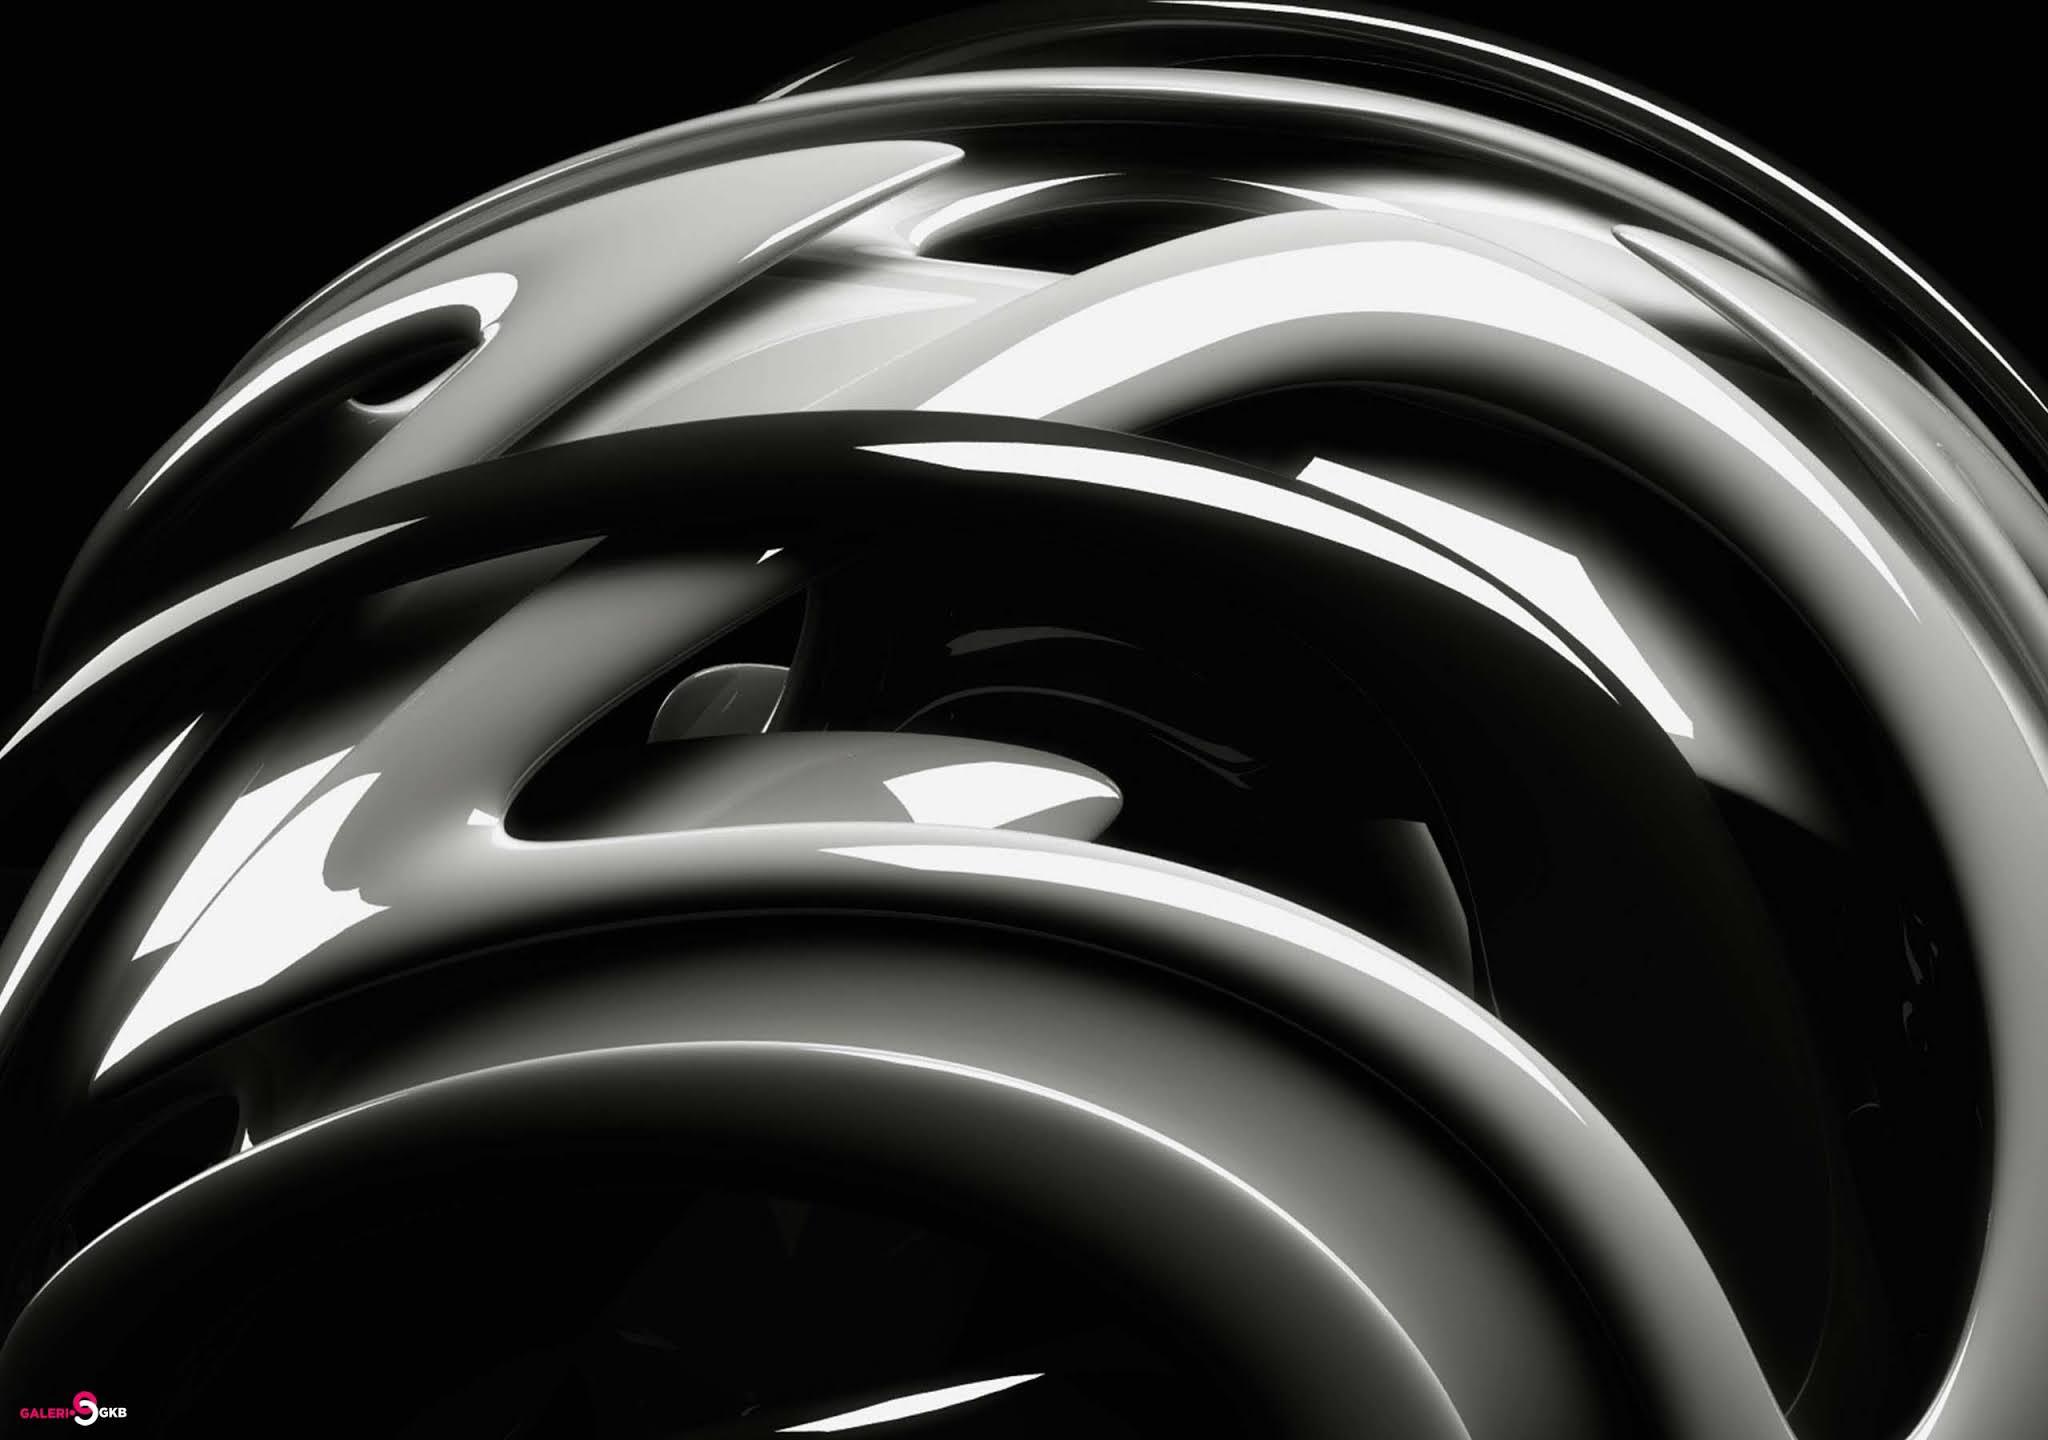 20 Abstract Artistic Wallpaper HD for PC Desktop, Abstract HD Wallpaper